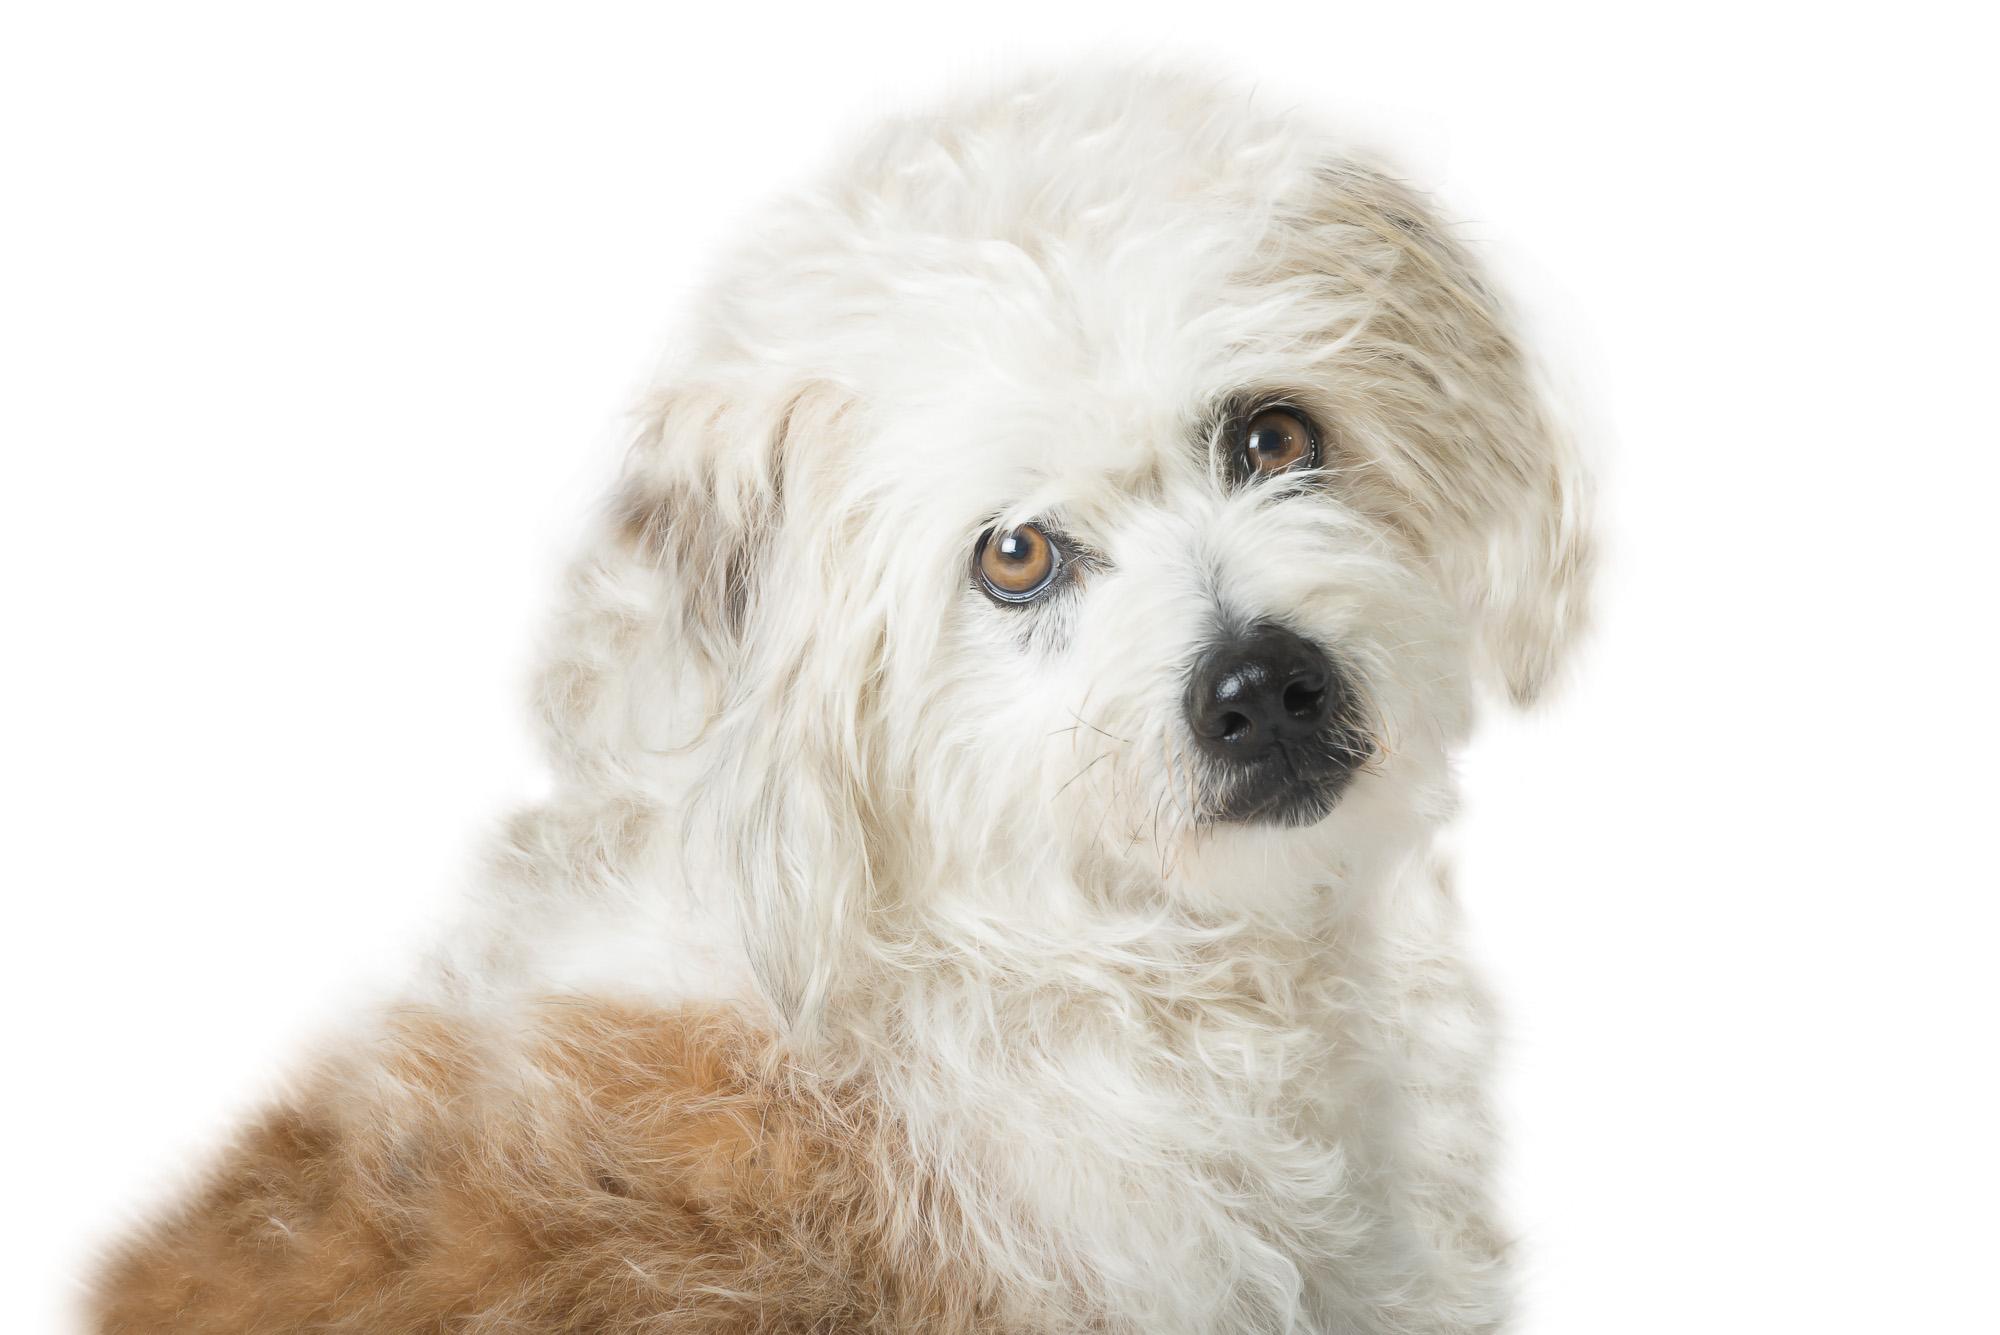 LupinBay-0118-Dog-Pet-Photography-1515.jpg